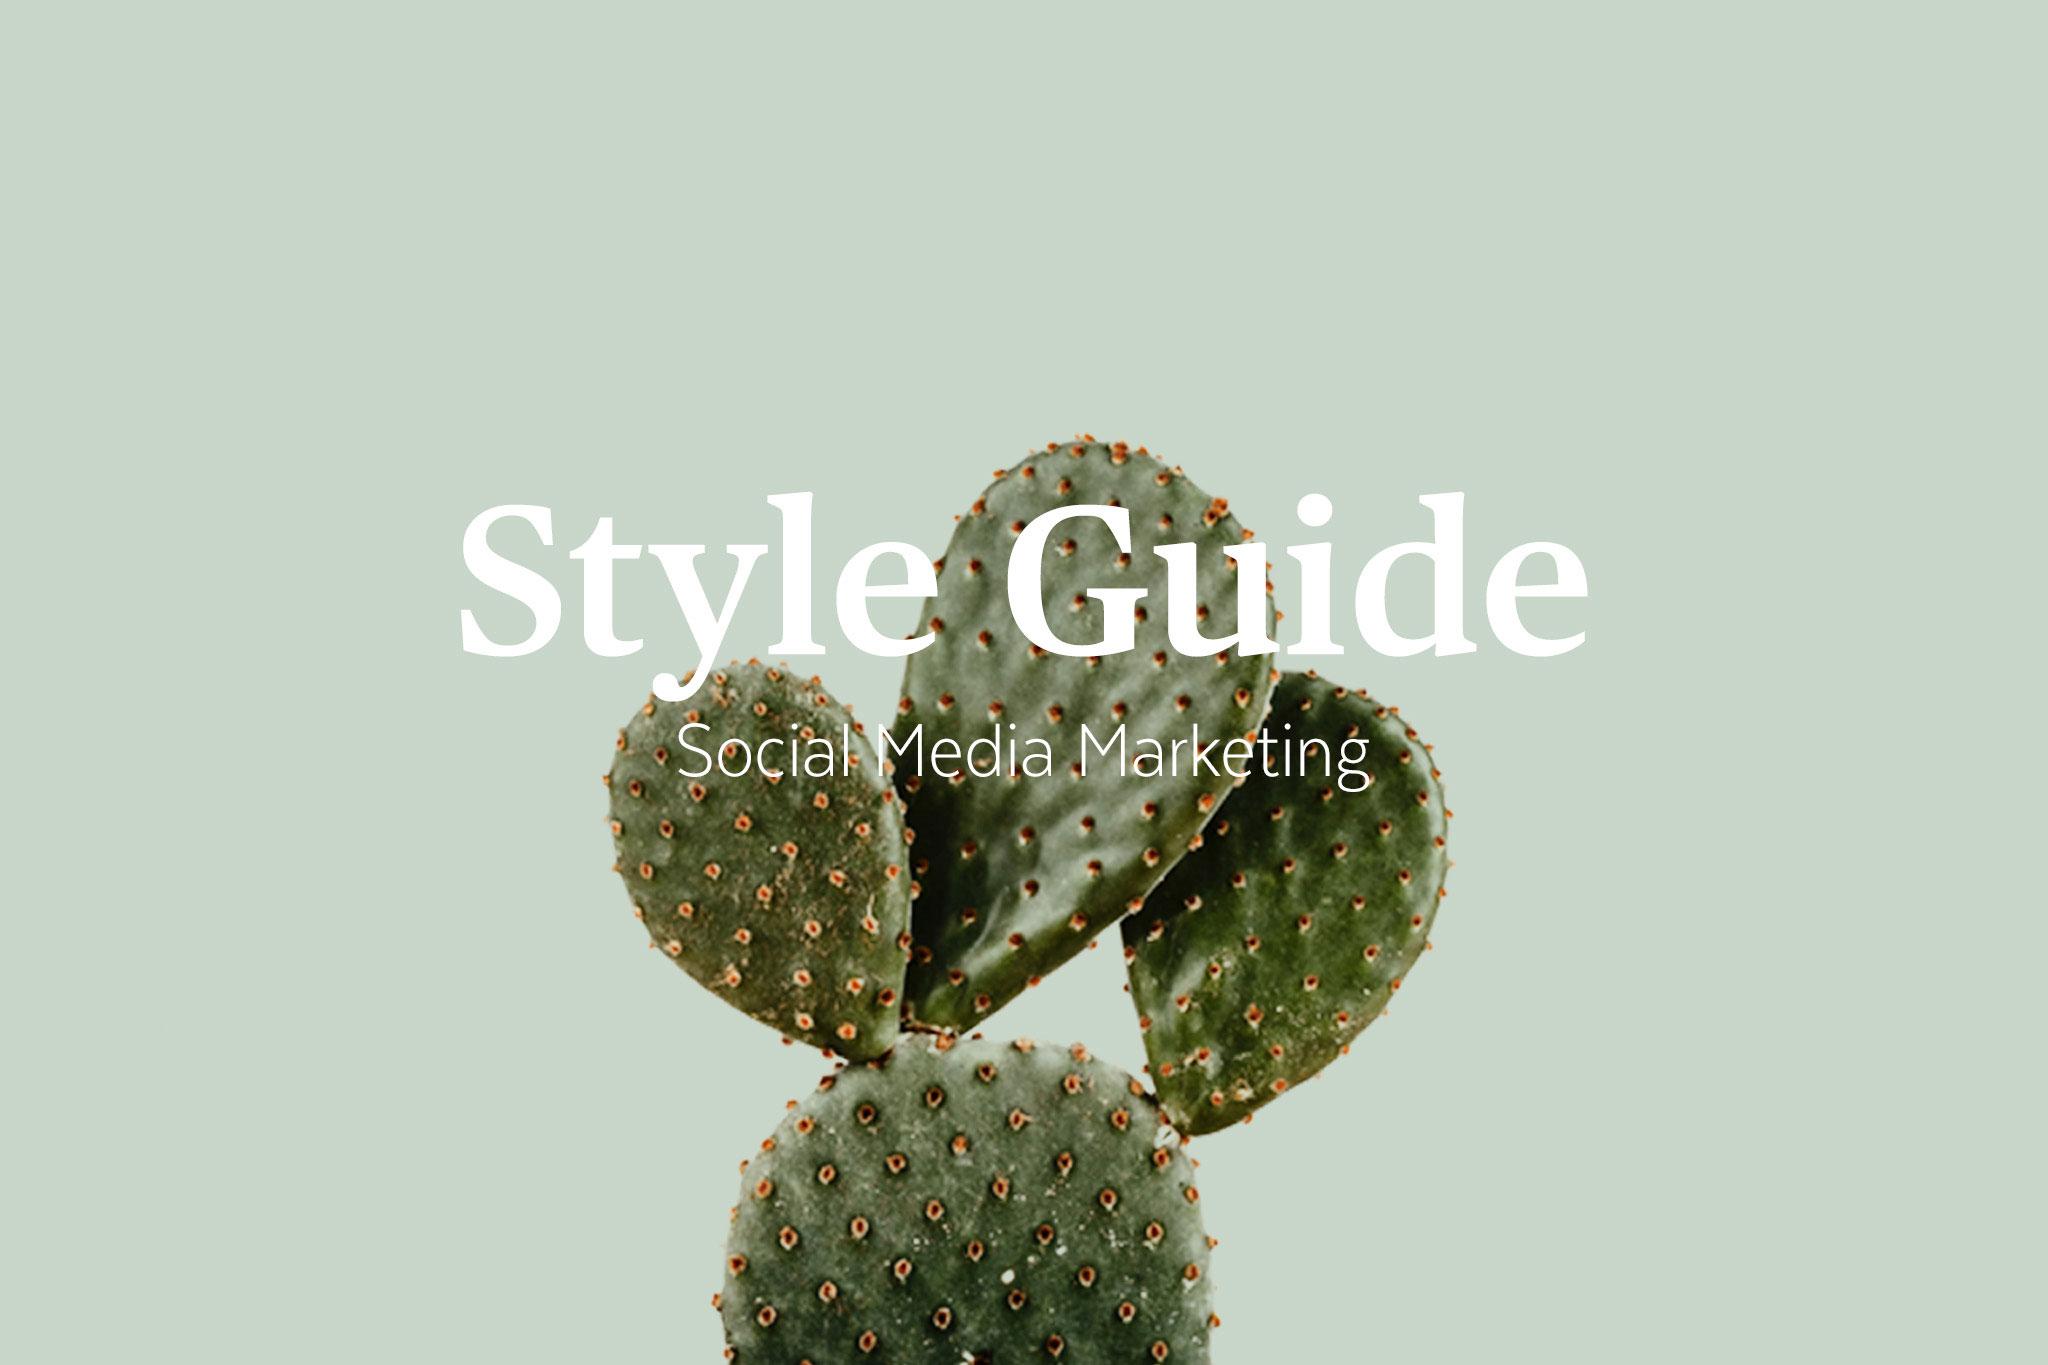 Style Guide - Social Media Marketing